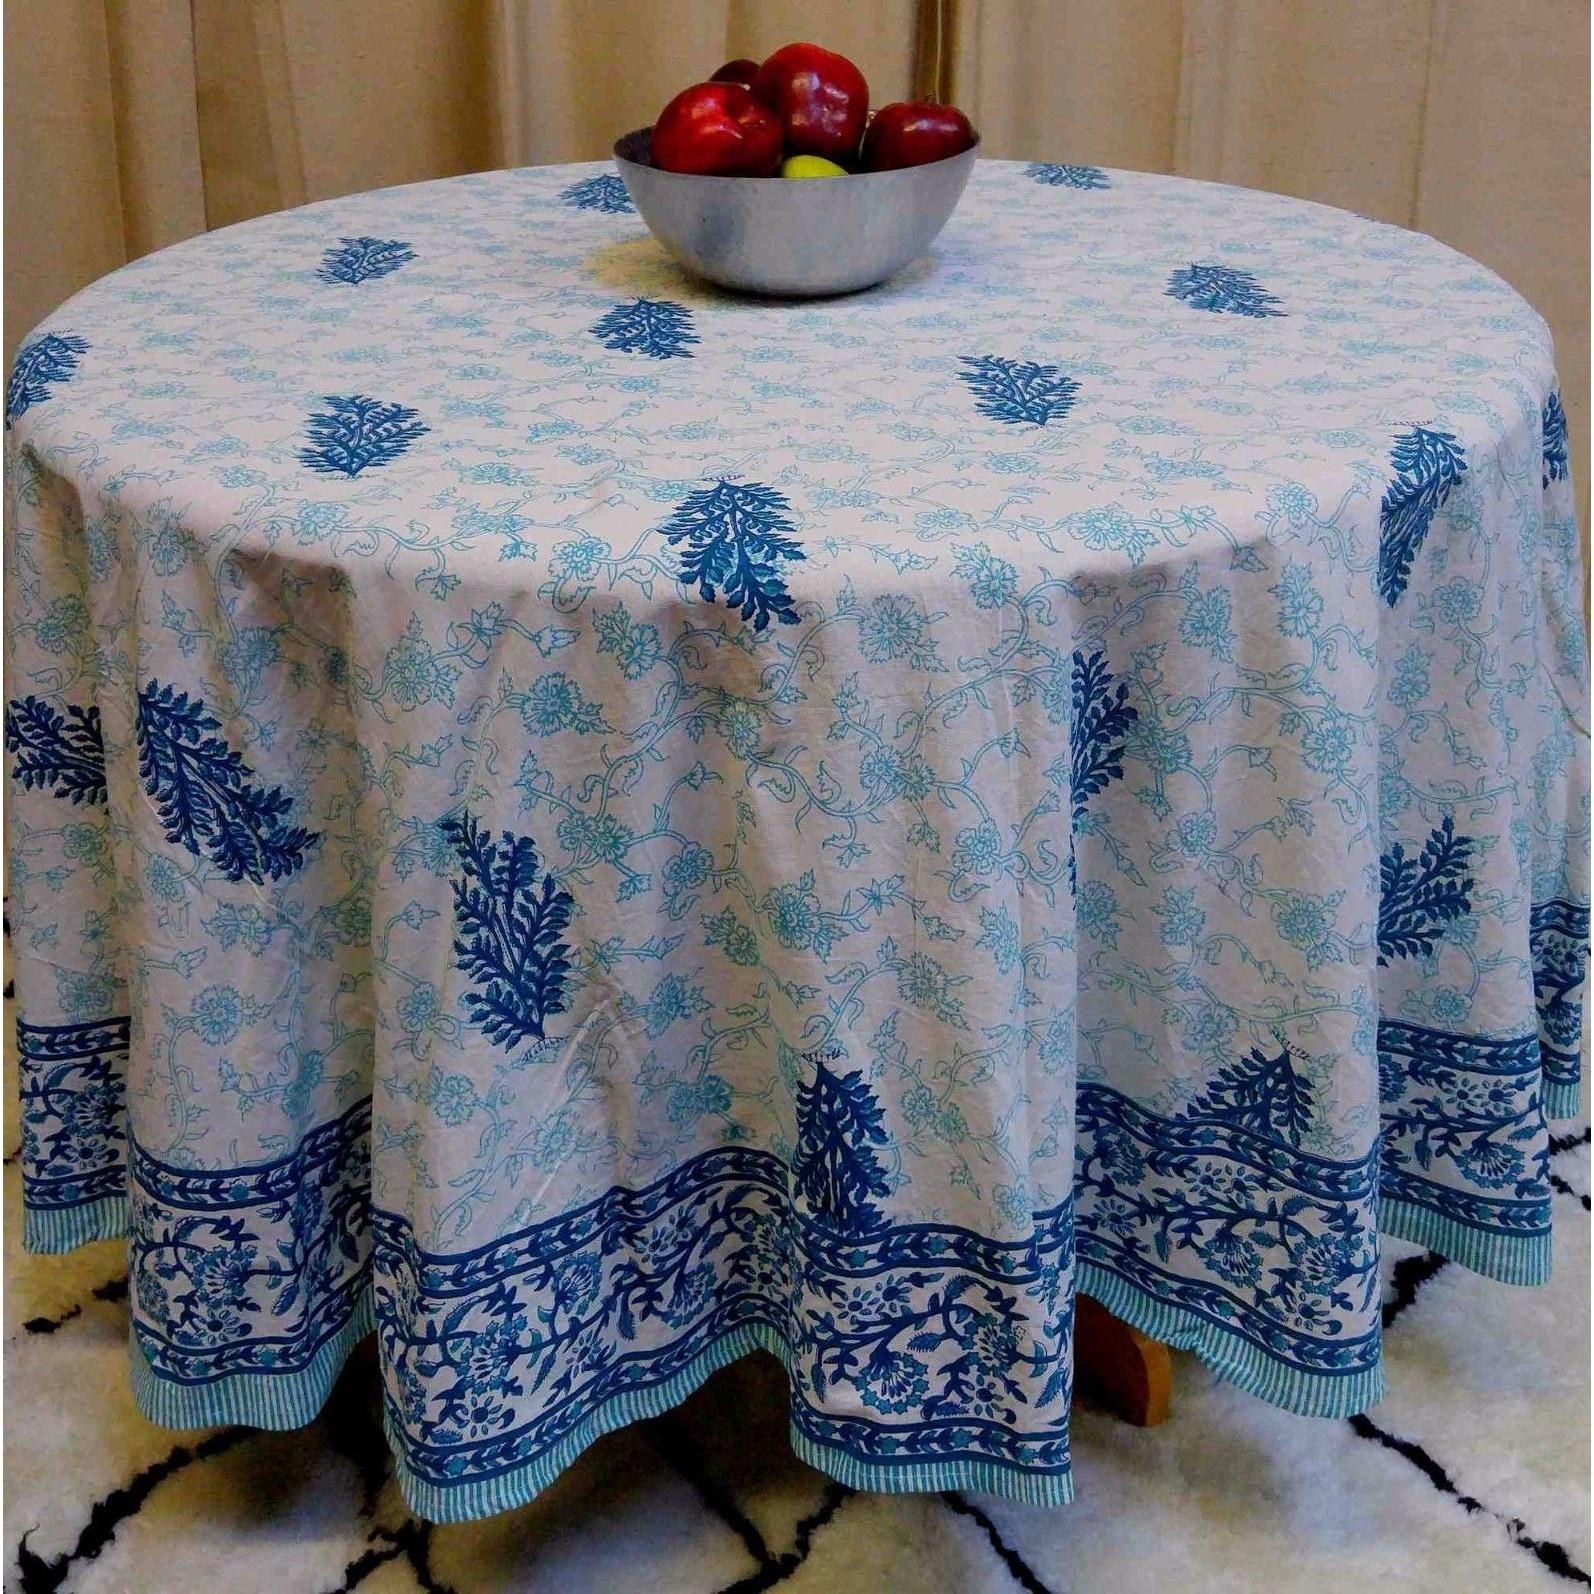 "Handmade 100% Cotton Floral Tablecloth 90"" Round Teal Aqua - Thumbnail 0"